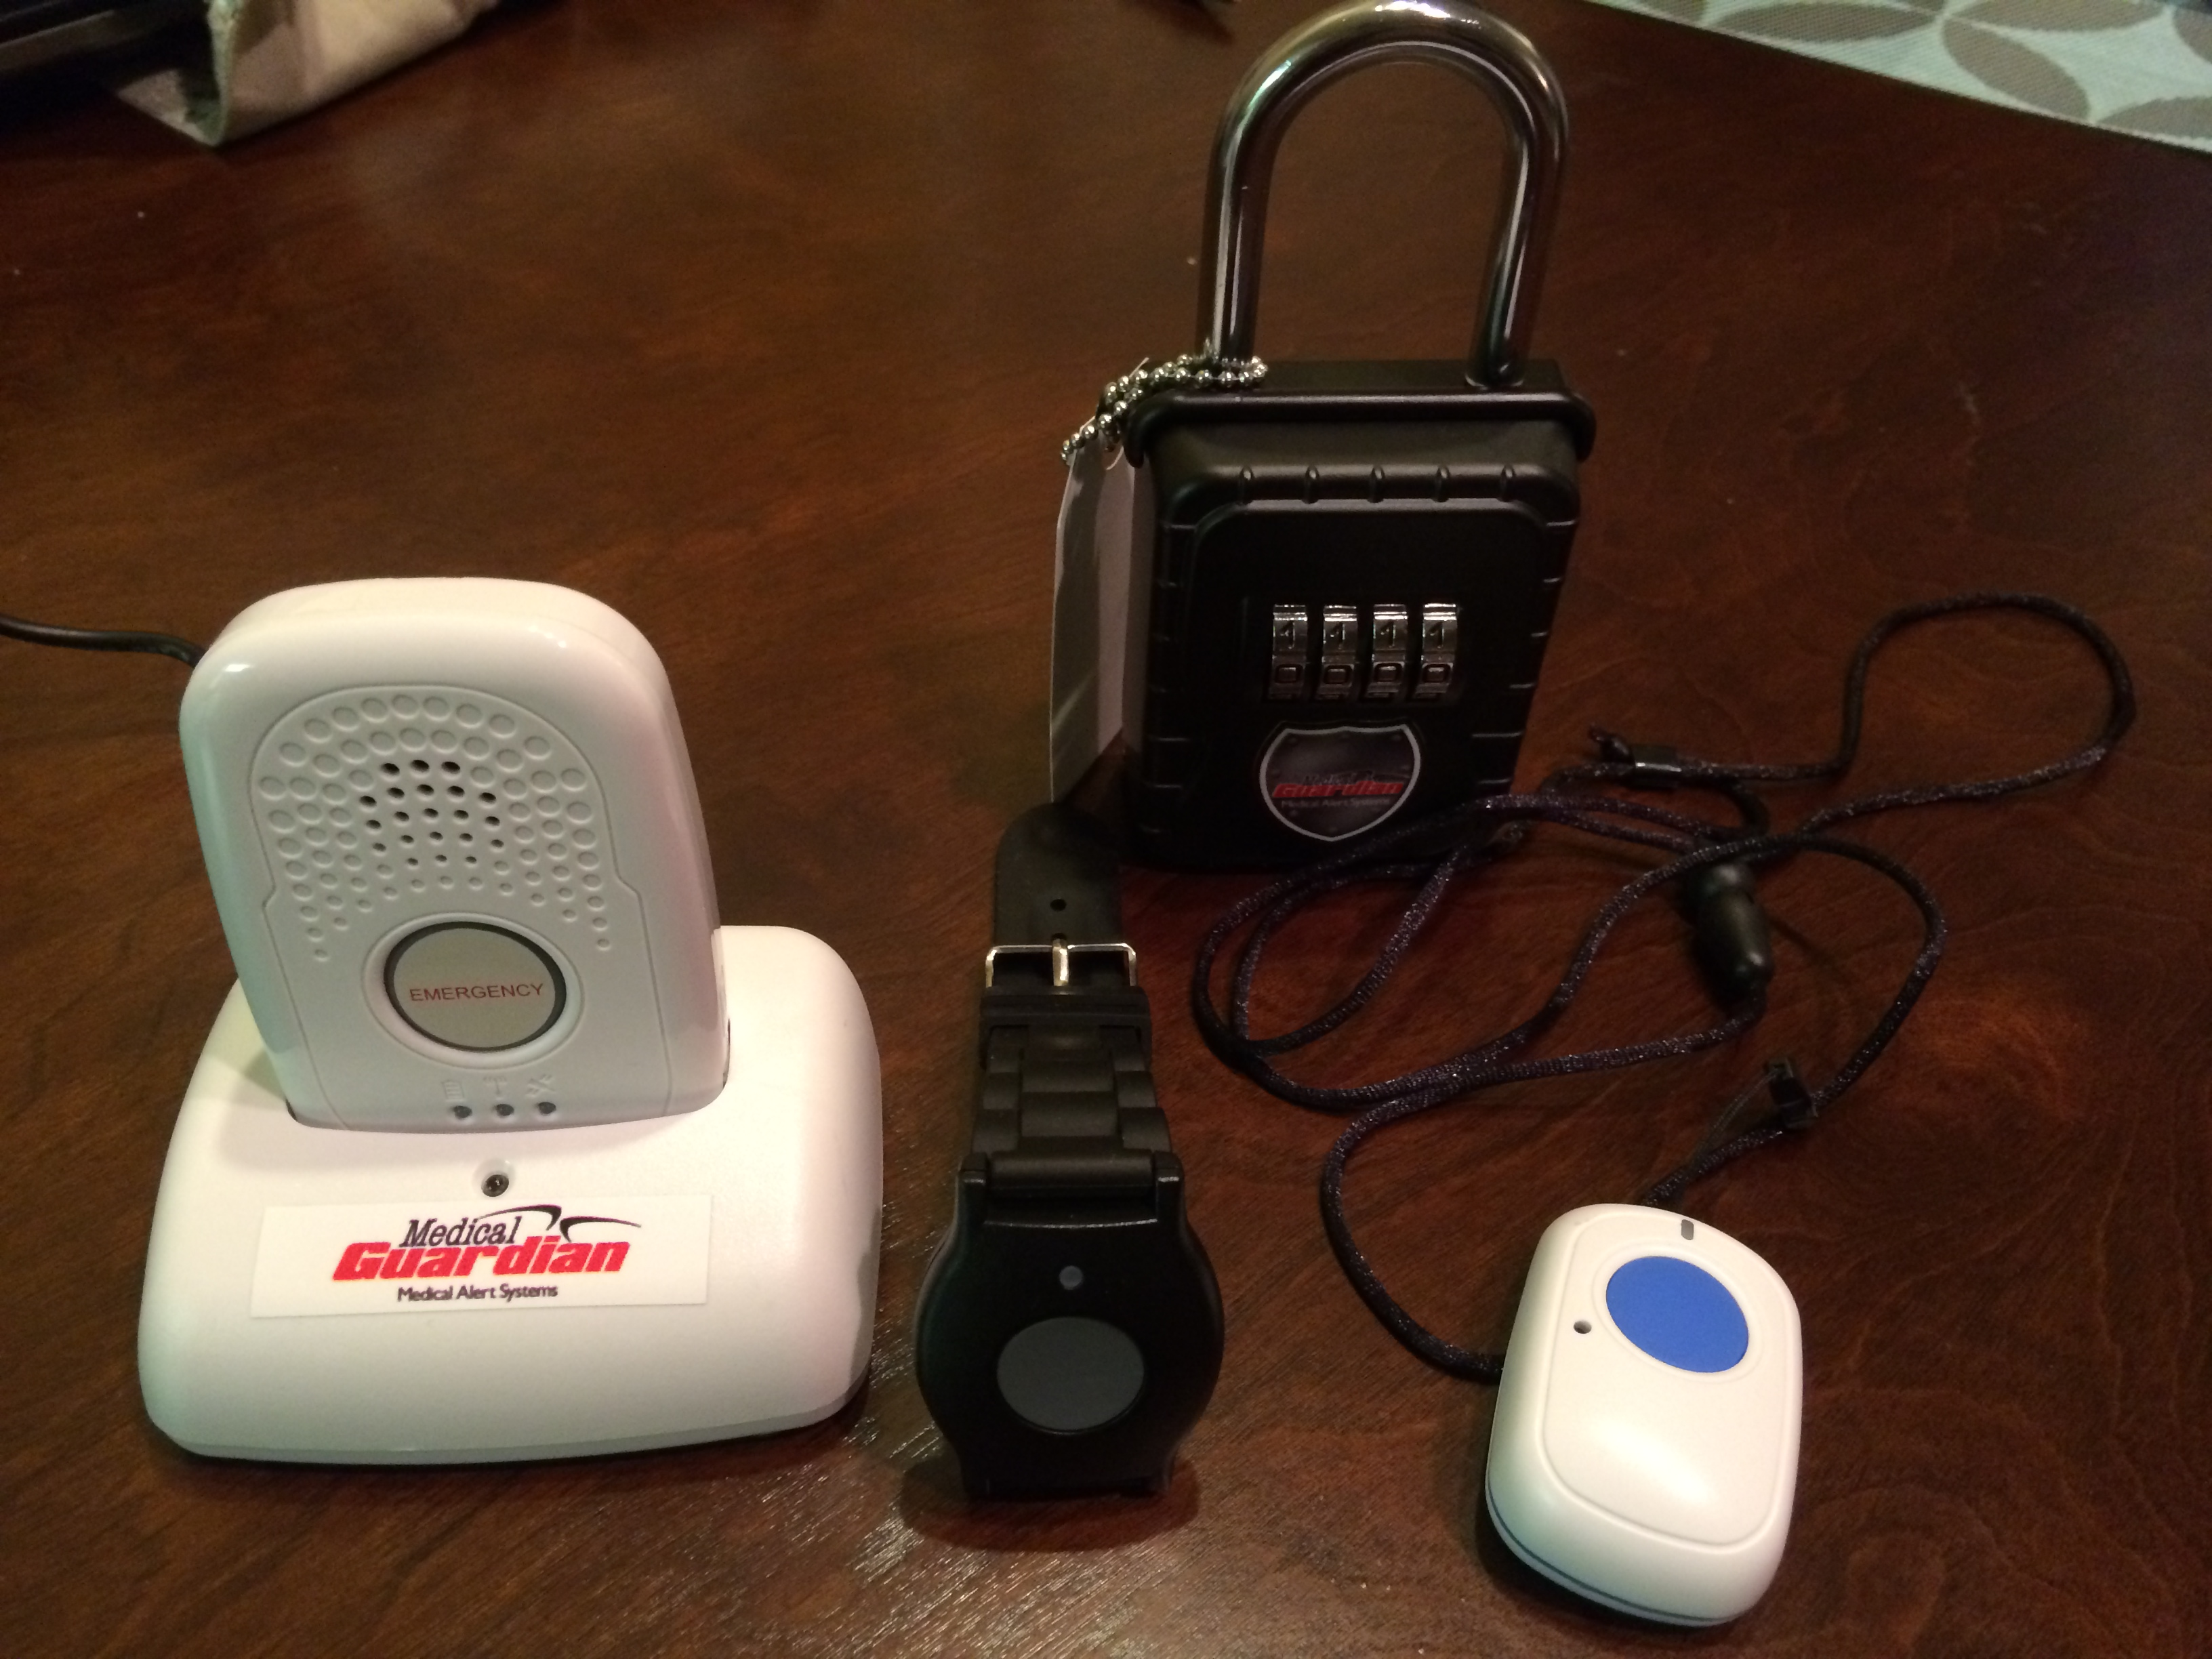 Advanced Safety Devices For Elderly Medical Alert Comparison